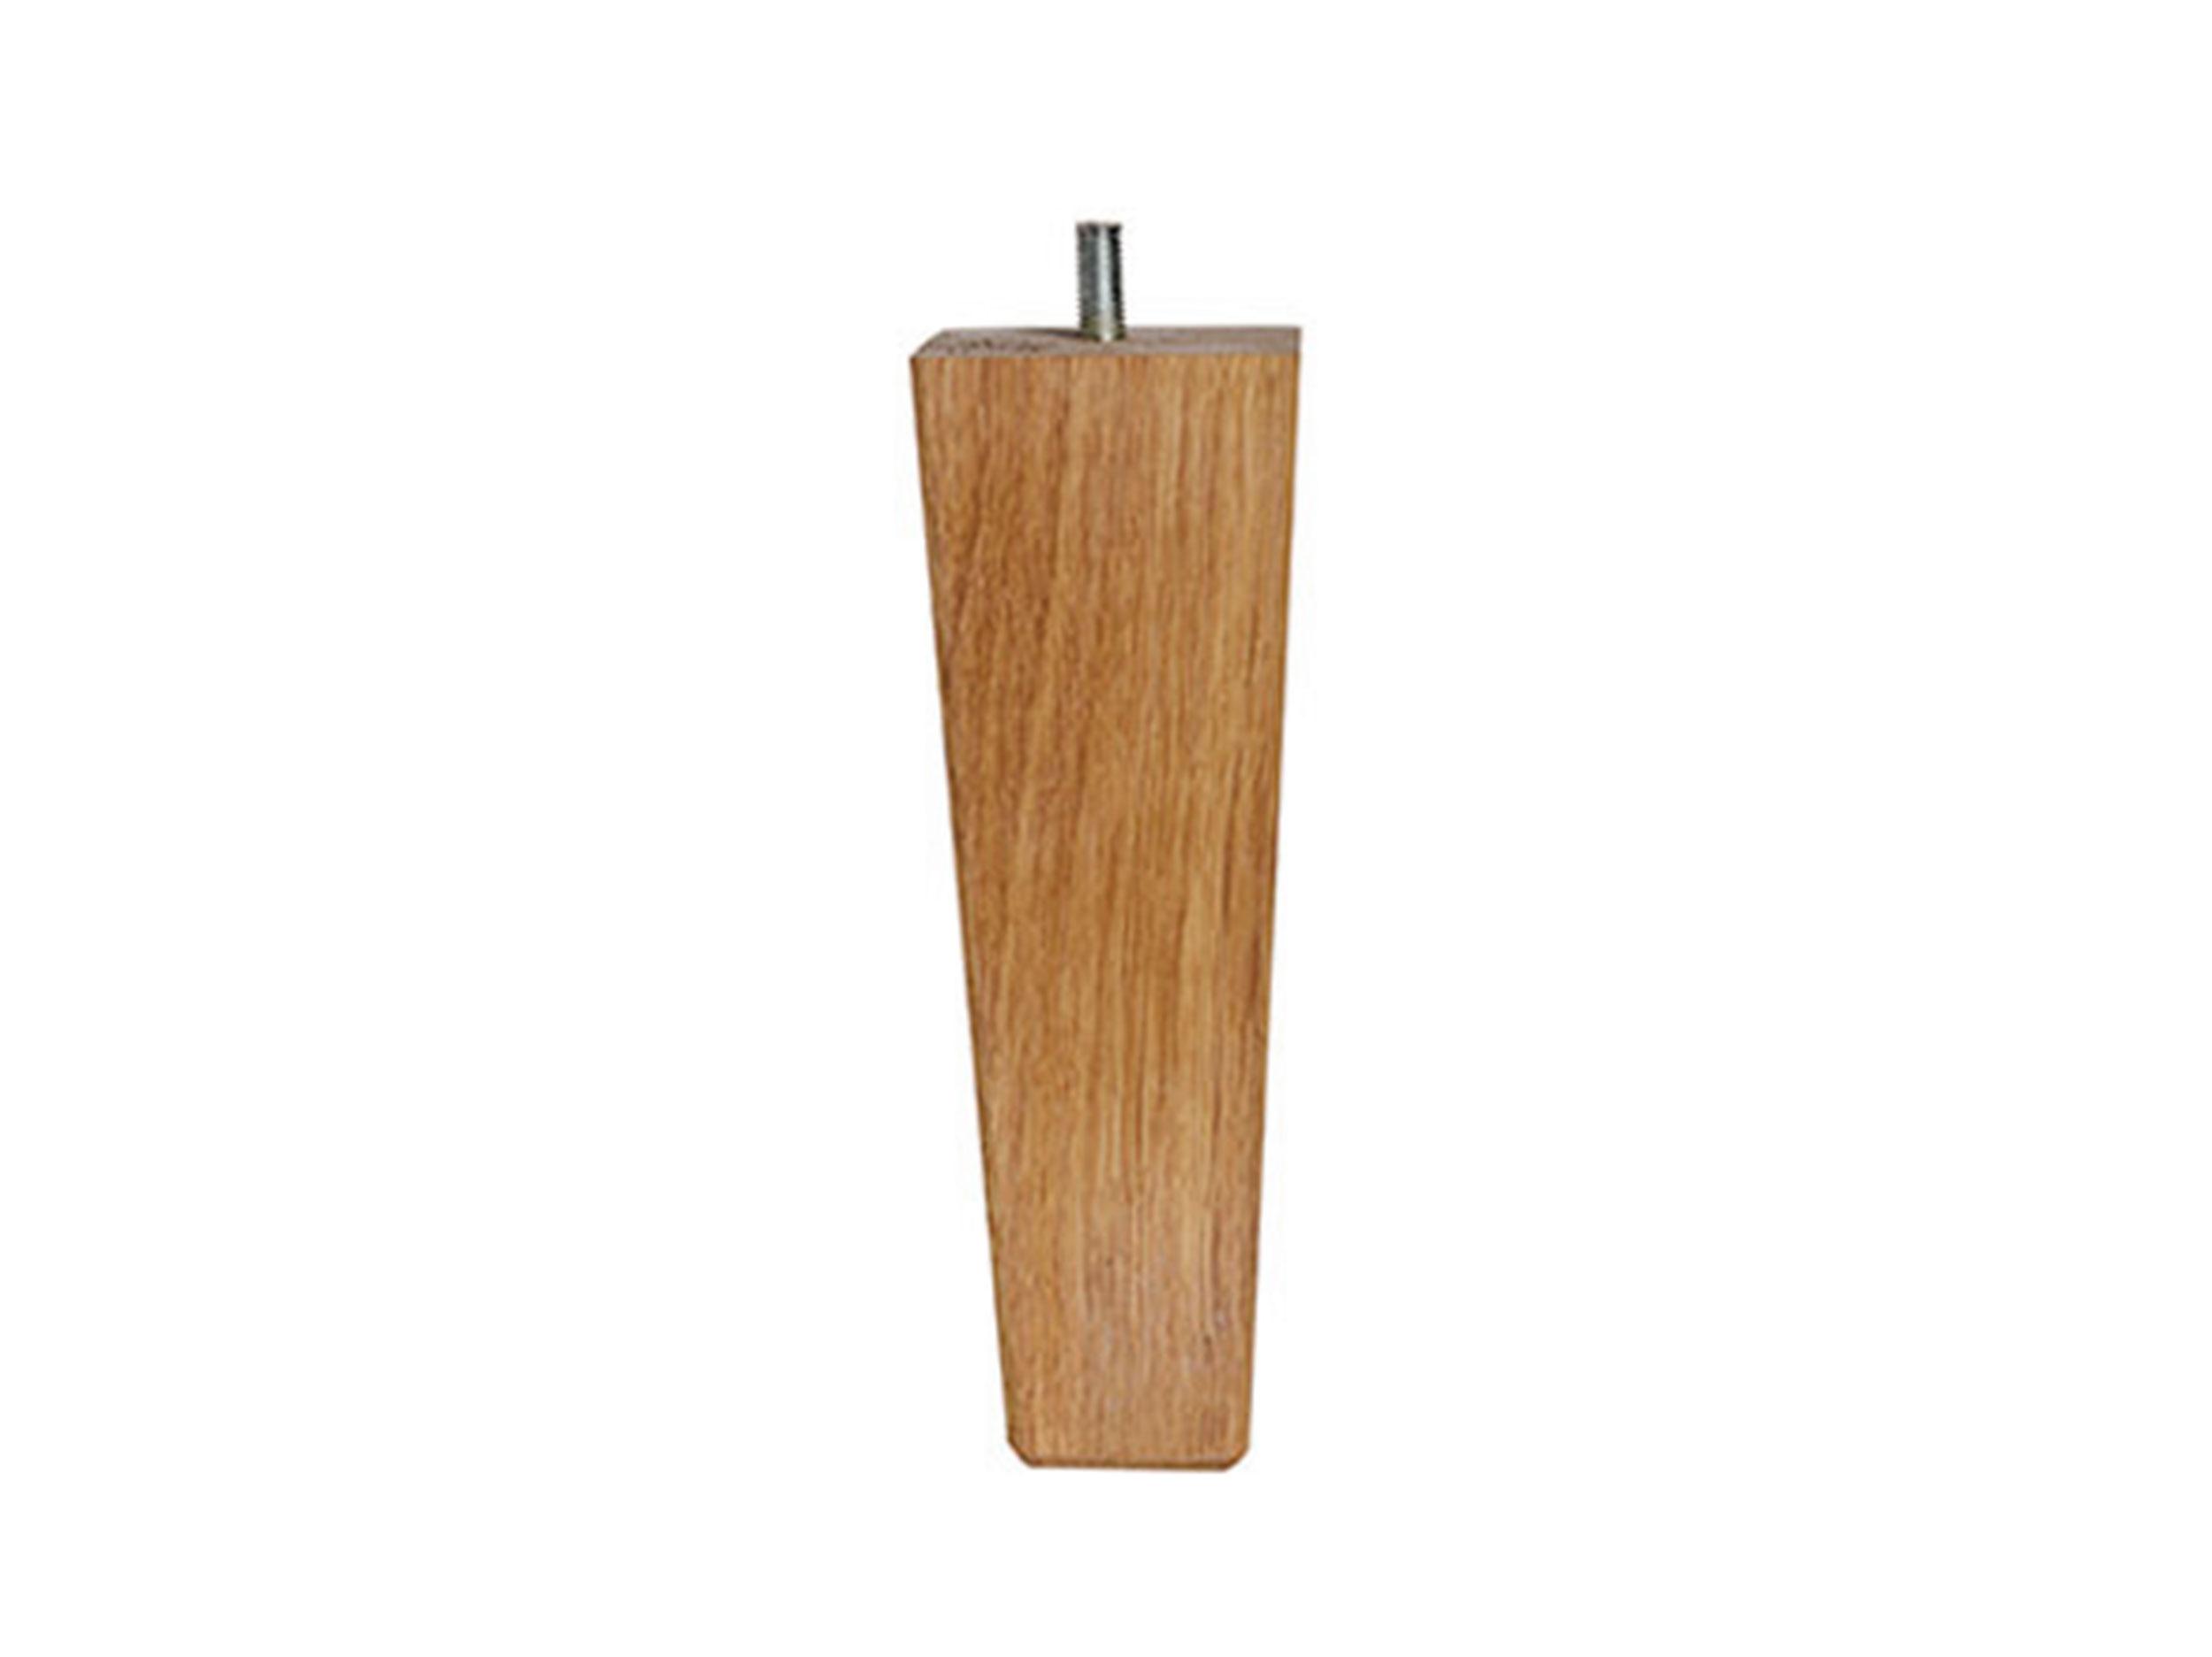 Konisk træben